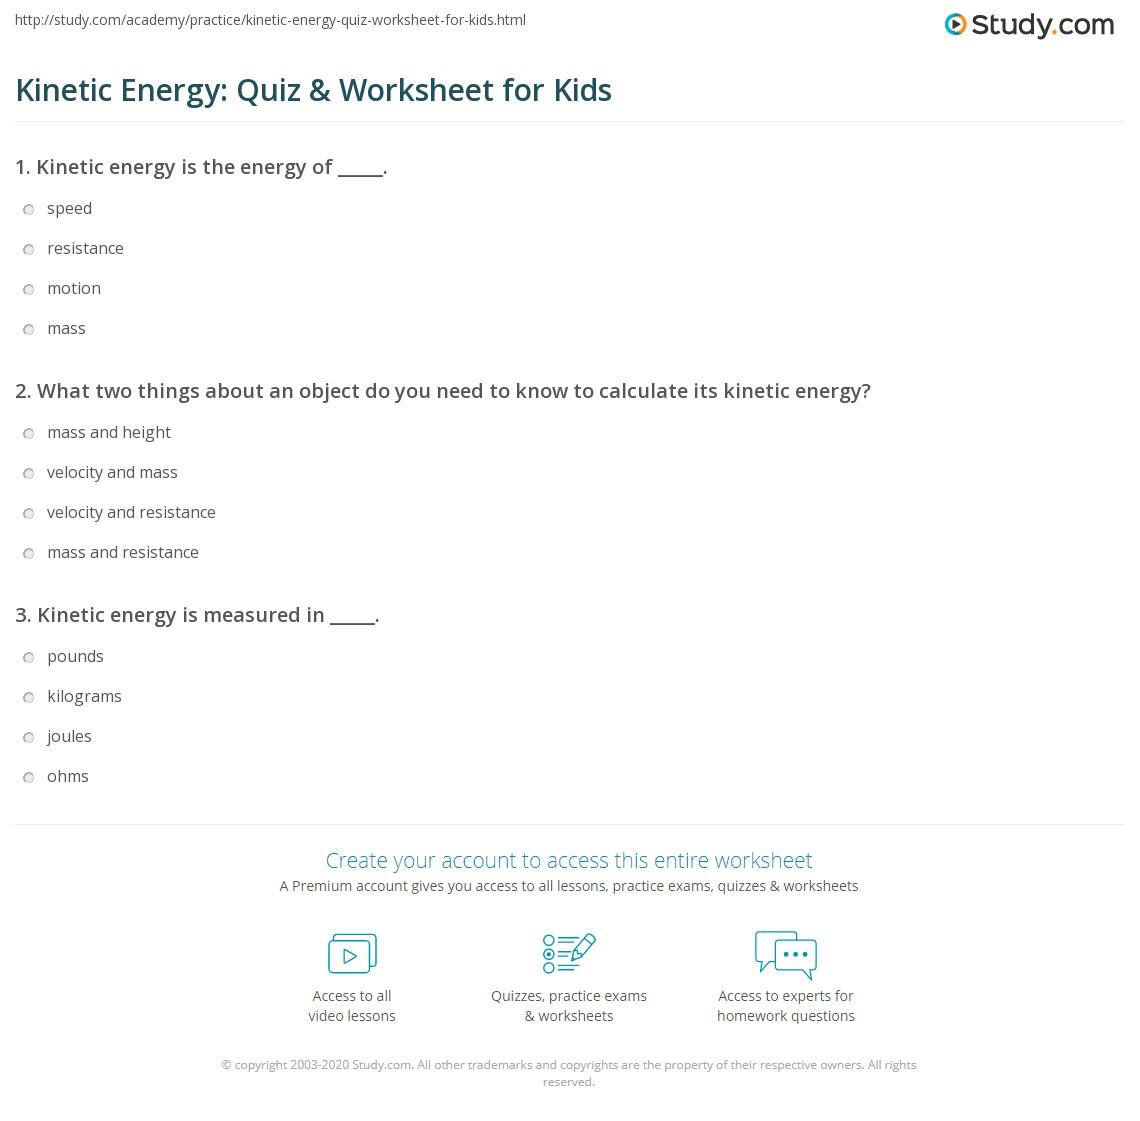 worksheet Kinetic Energy Worksheet kinetic energy quiz worksheet for kids study com print lesson definition examples worksheet